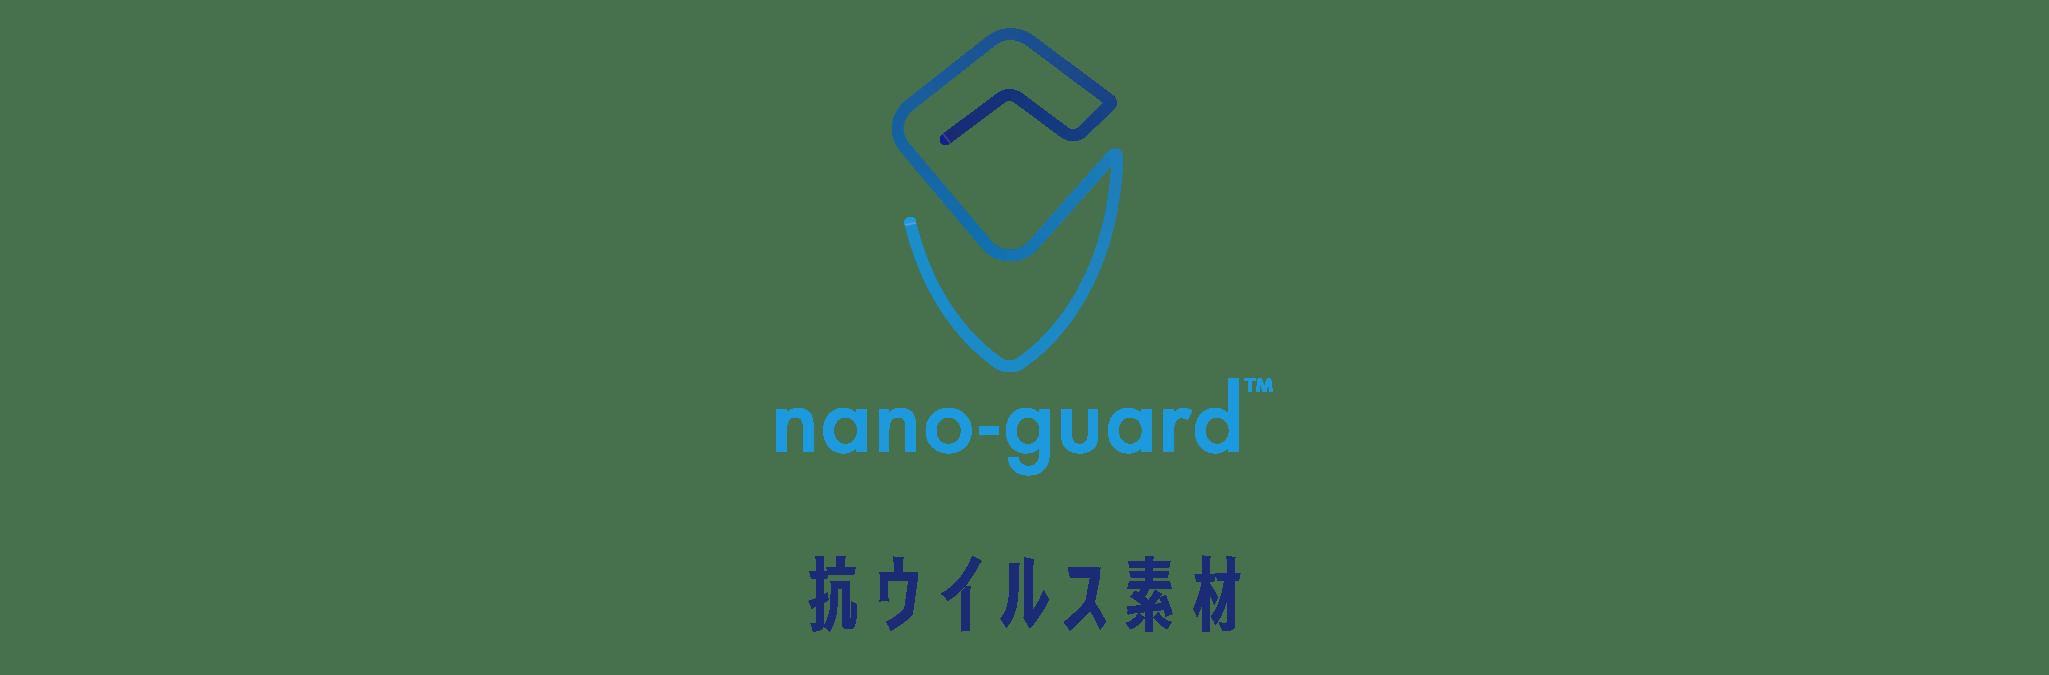 nano-guard 抗ウイルス素材